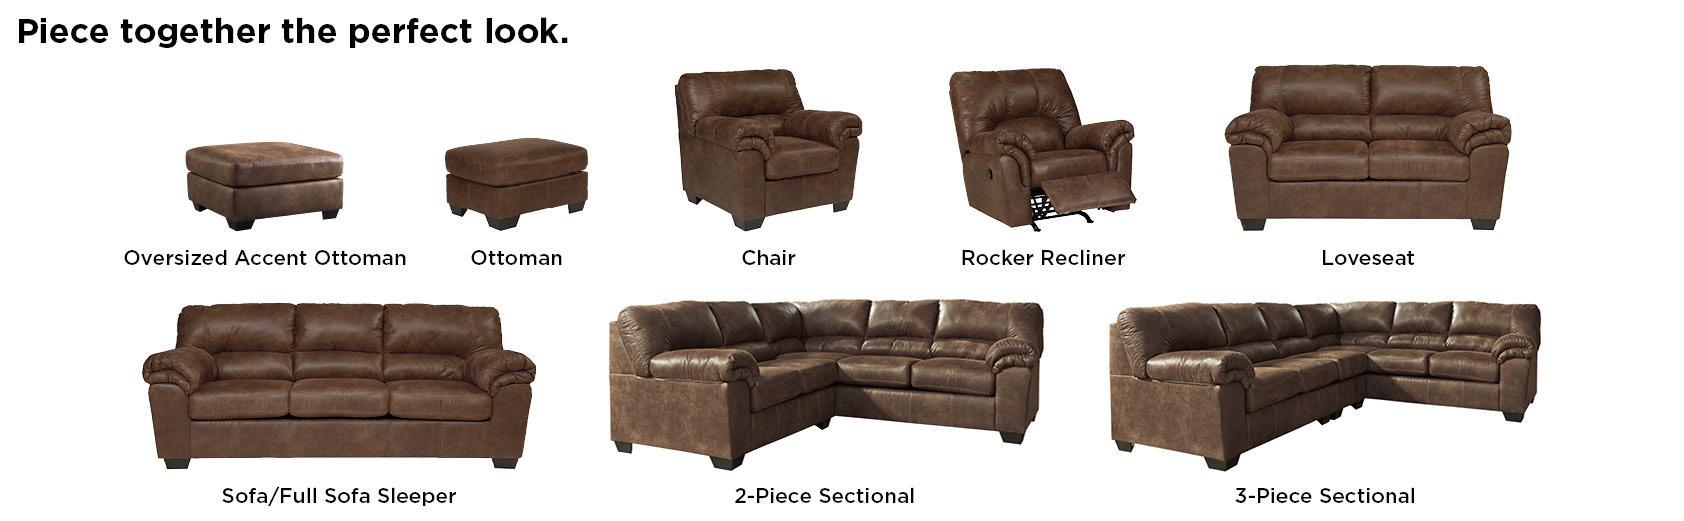 Super Amazon Cambodia Shopping On Amazon Ship To Cambodia Ship Dailytribune Chair Design For Home Dailytribuneorg